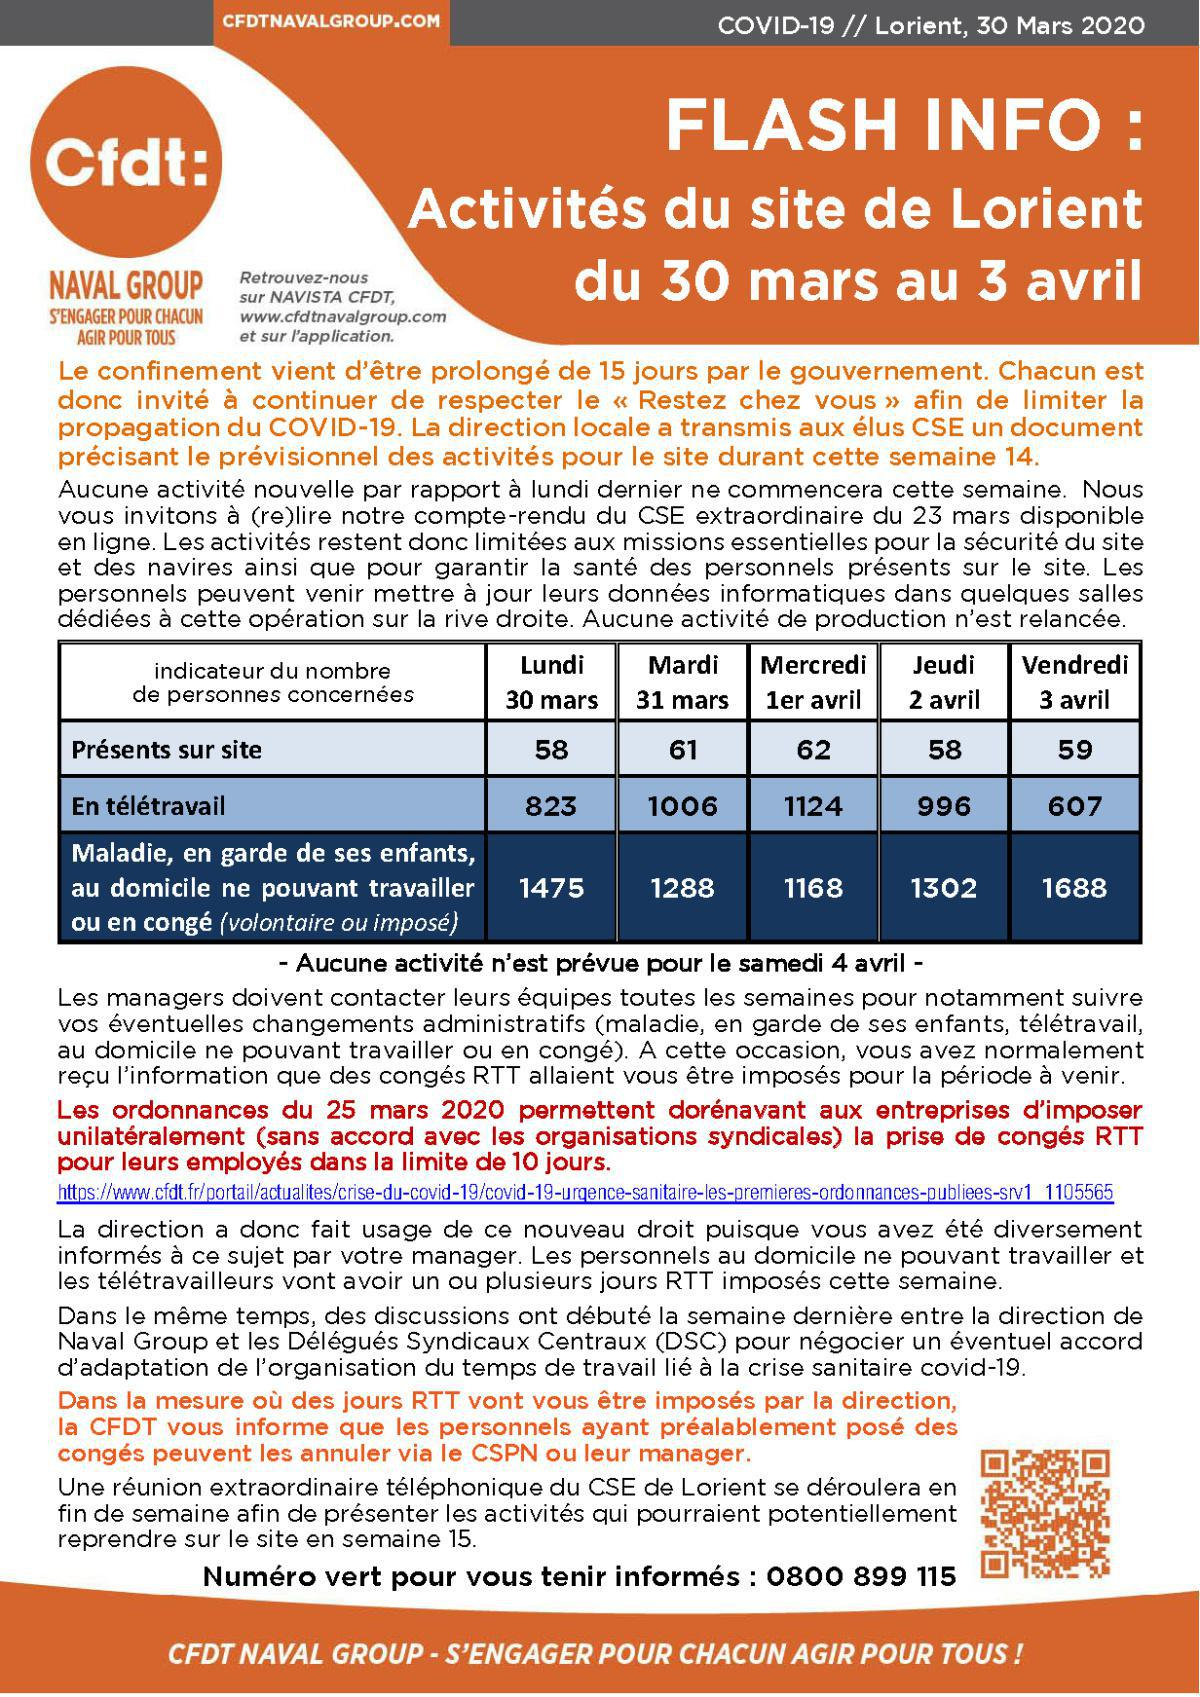 Flash info Lorient